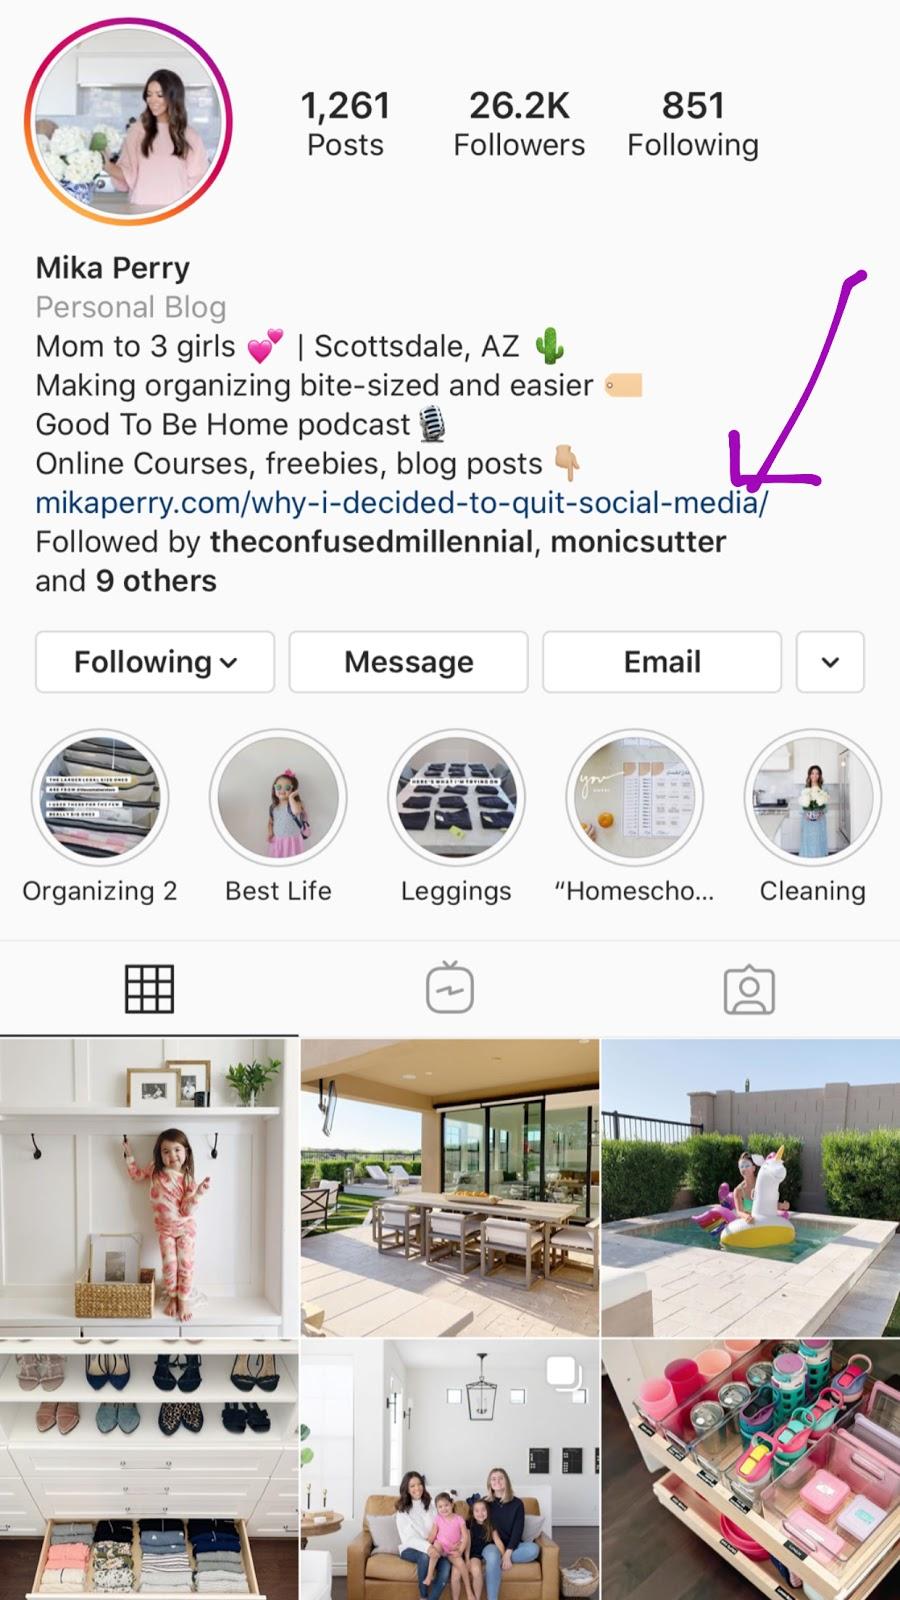 mika perry instagram bio link optimize your instagram bio